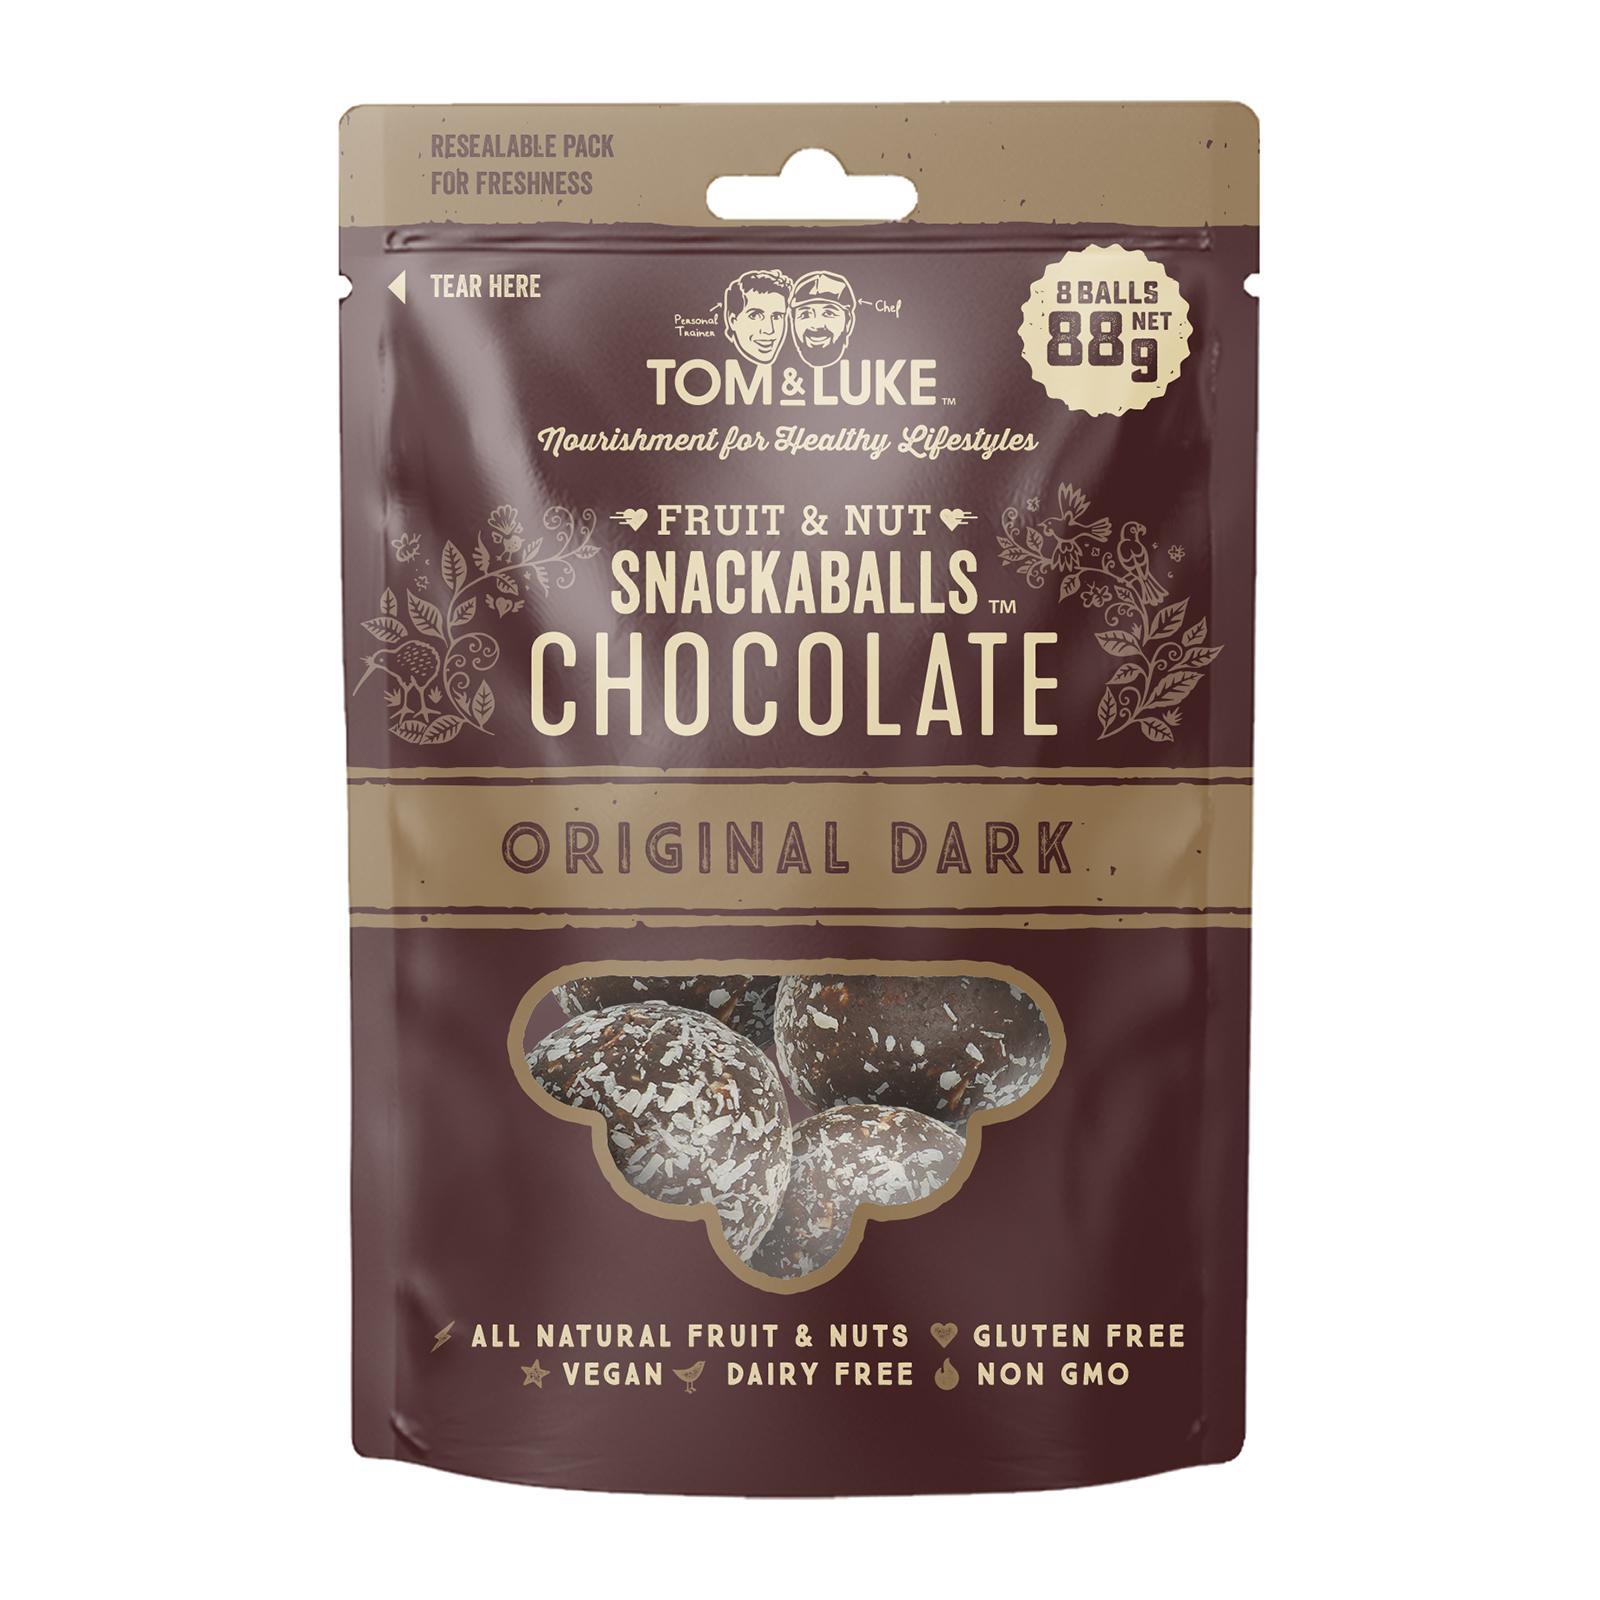 Tom & Luke Snackaball - Dark Chocolate Original